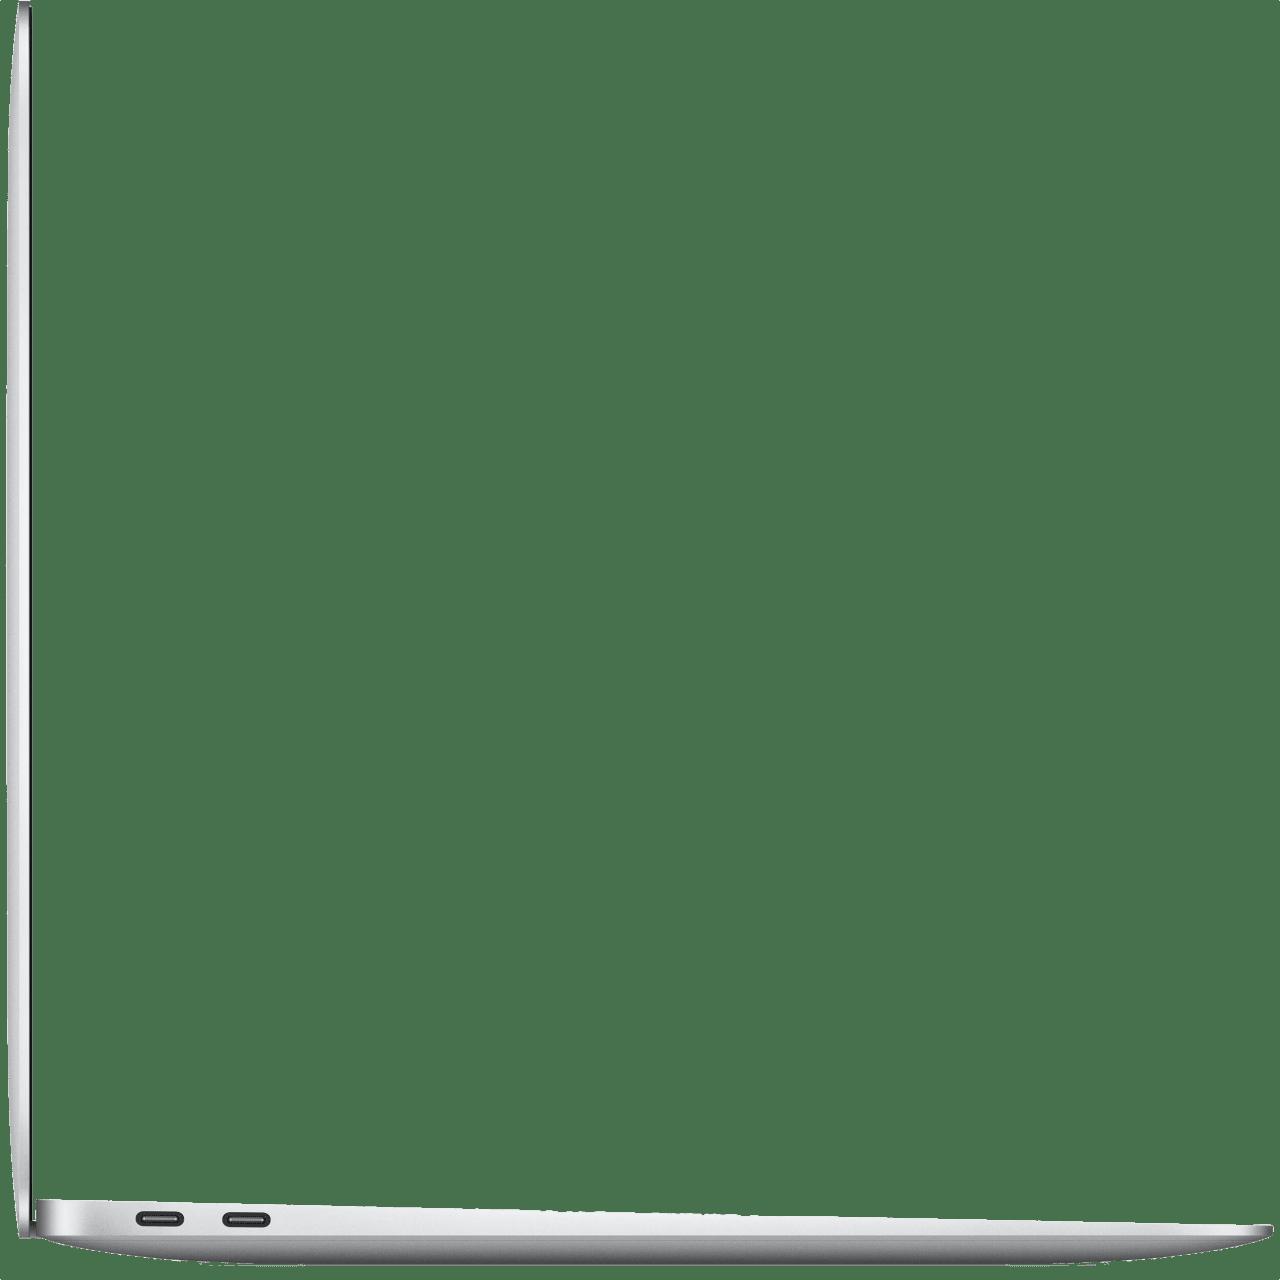 Silver Apple MacBook Air (Late 2020) - Spanish (QWERTY) Laptop - Apple M1 - 8GB - 256GB SSD - Apple Integrated 7-core GPU.3